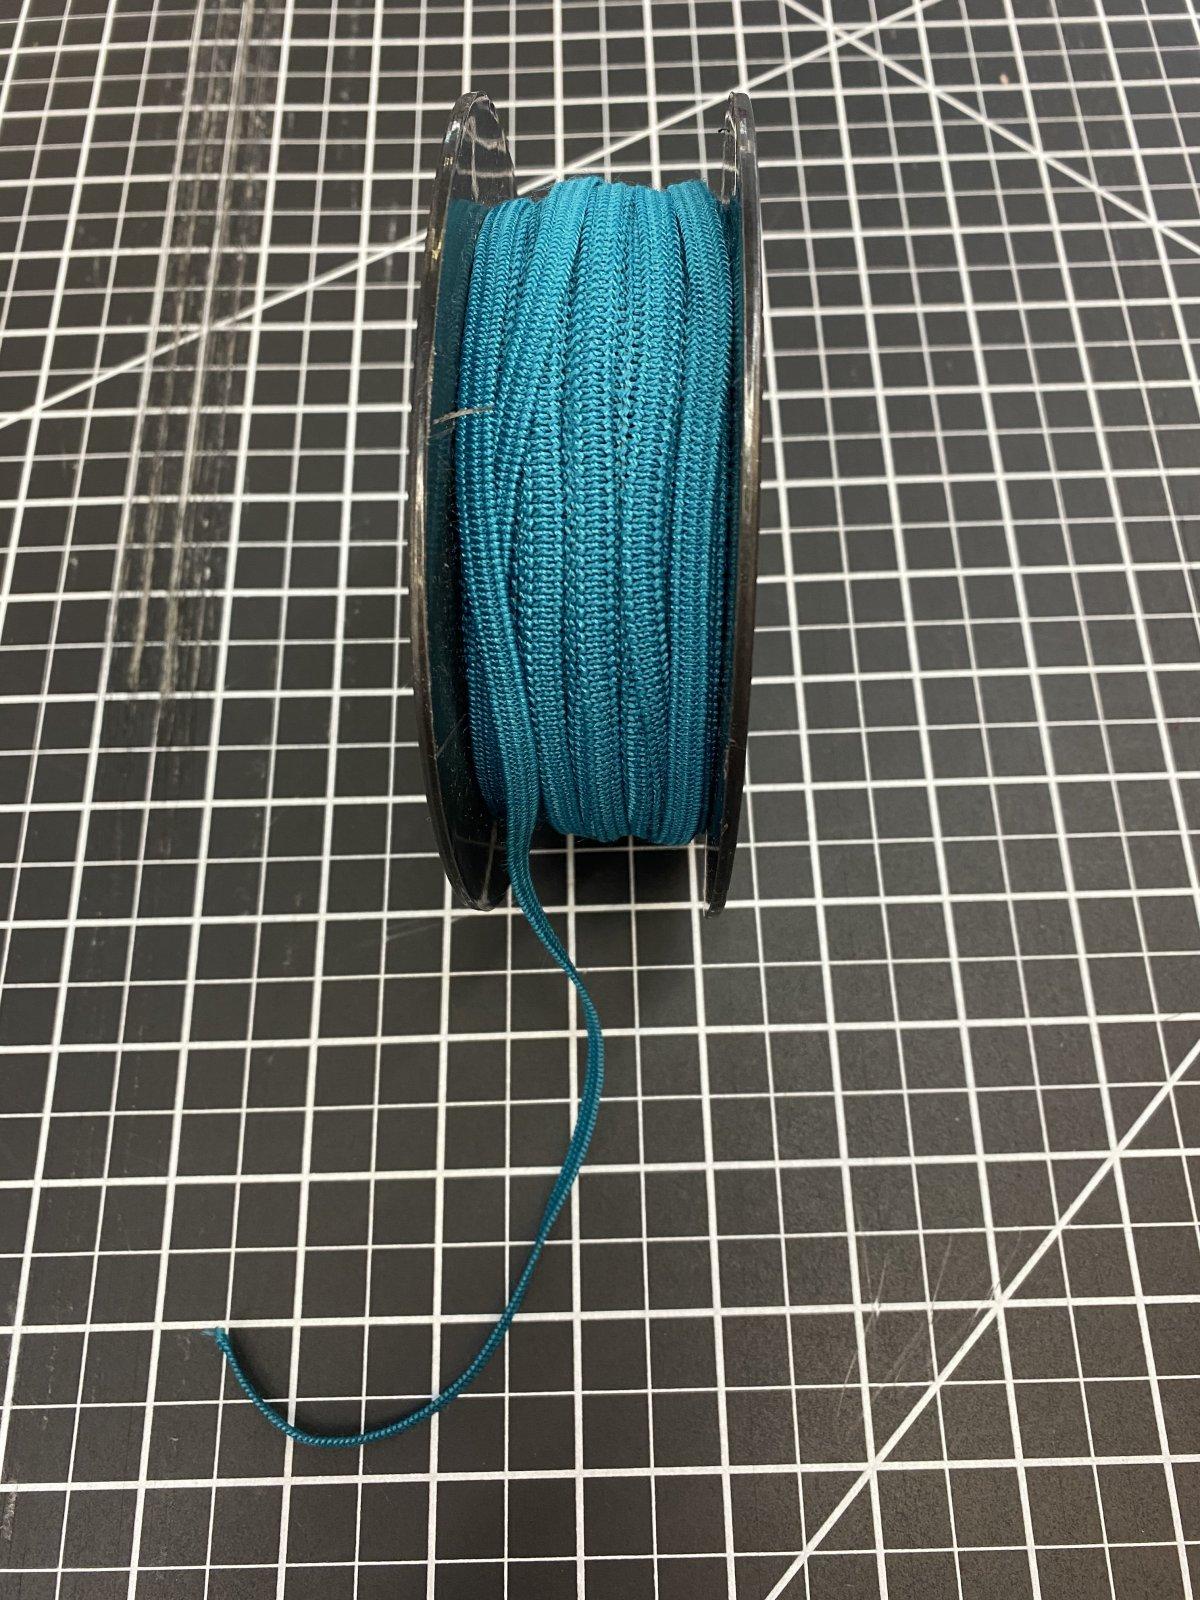 Turquoise Elastic 5 mm / .2